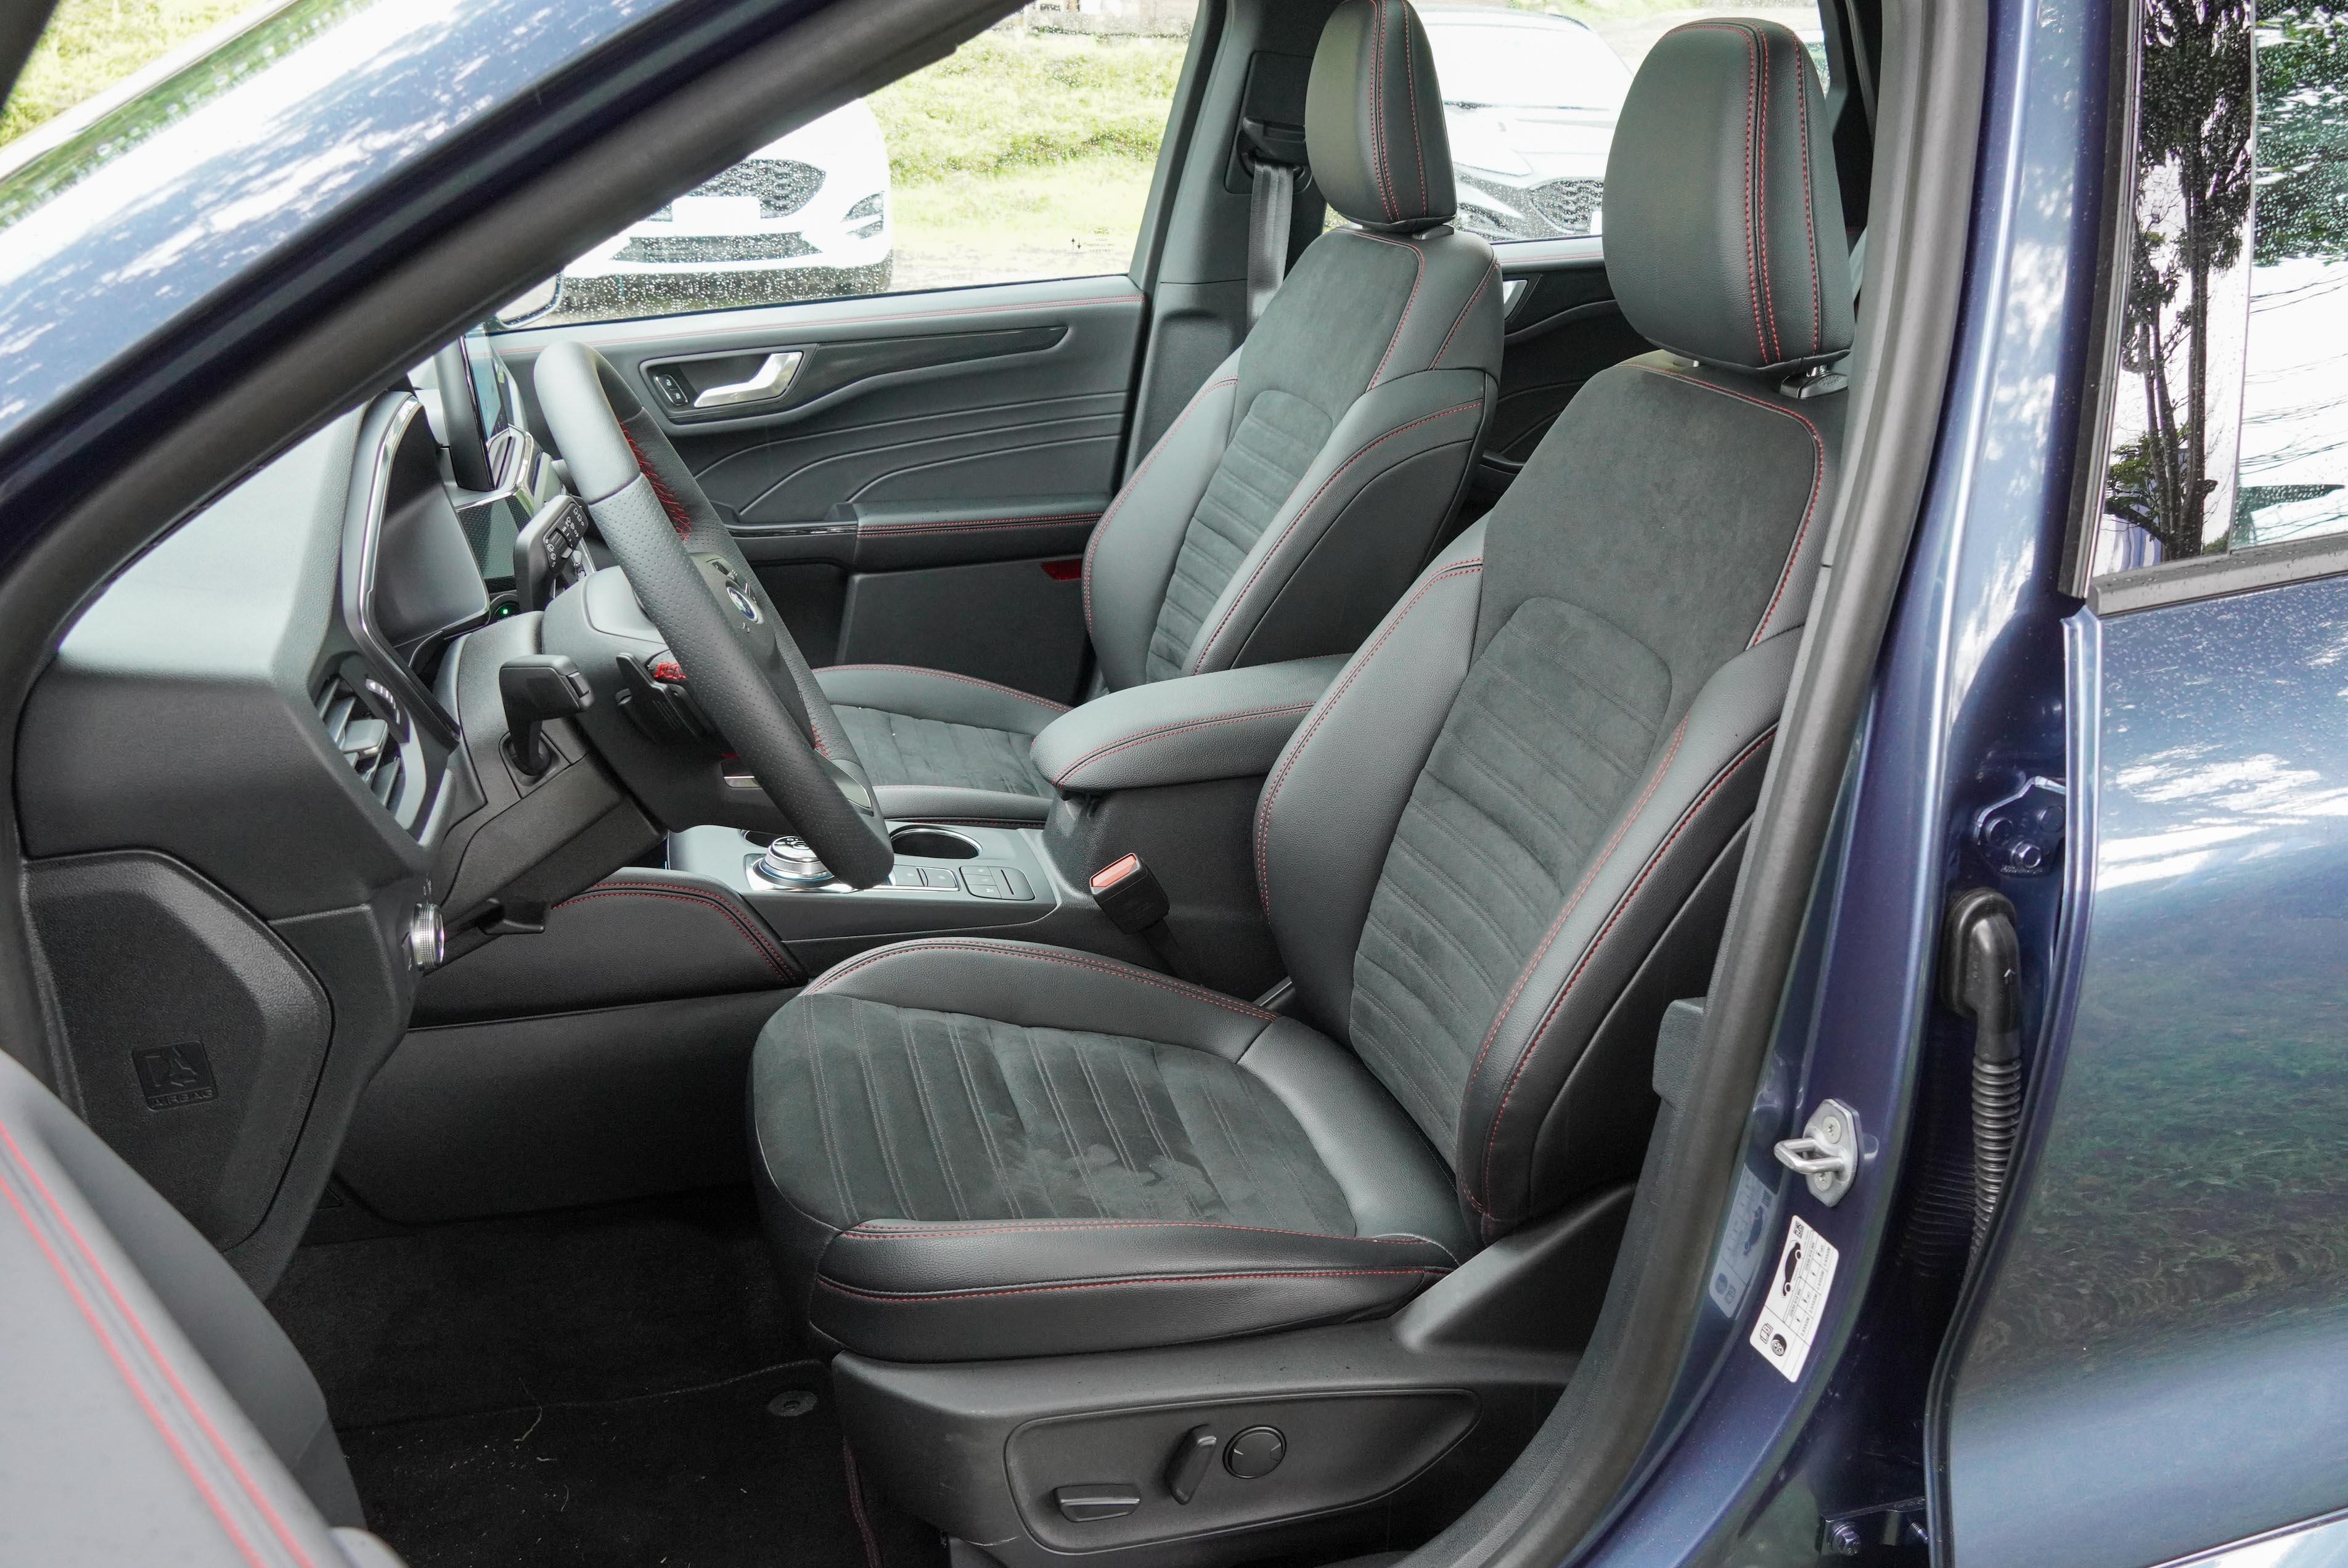 ST-Line 標配類麂皮運動座椅,附駕駛座 10 向電動調整。